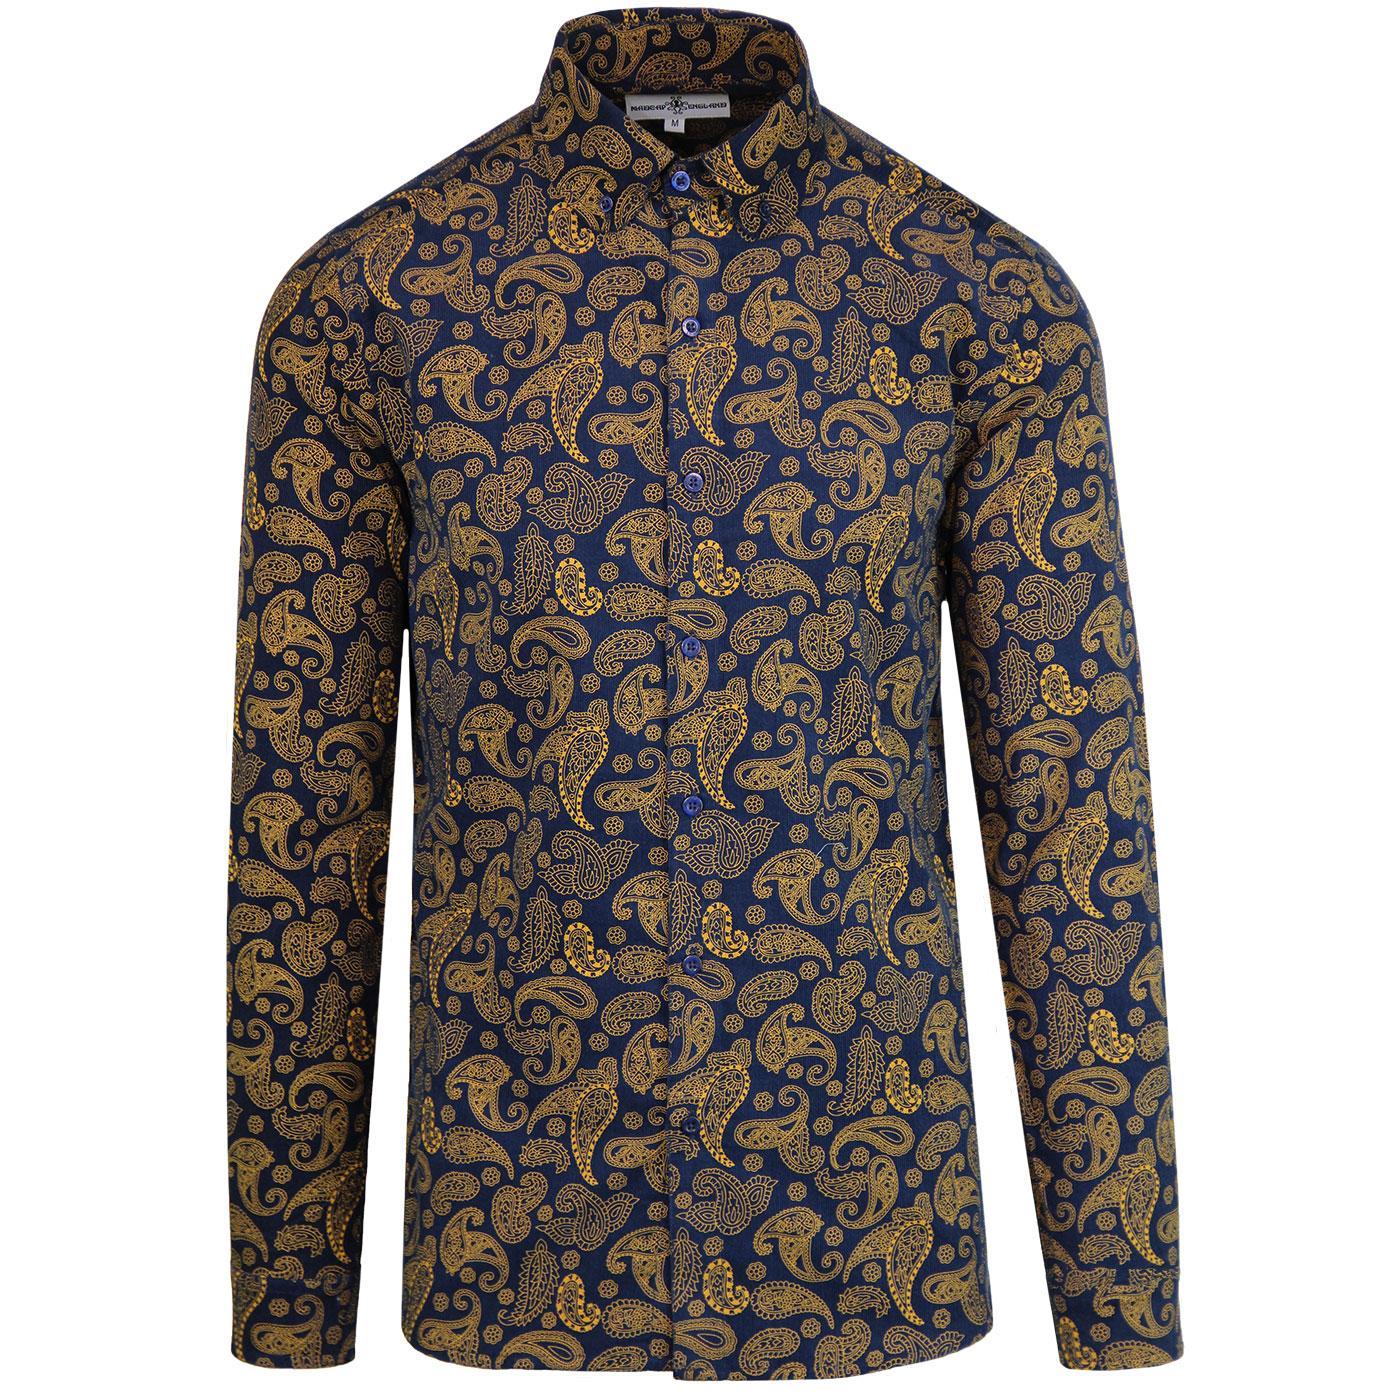 Madcap England Kinfauns 1960s Mod Cord Paisley penny Collar shirt in Navy